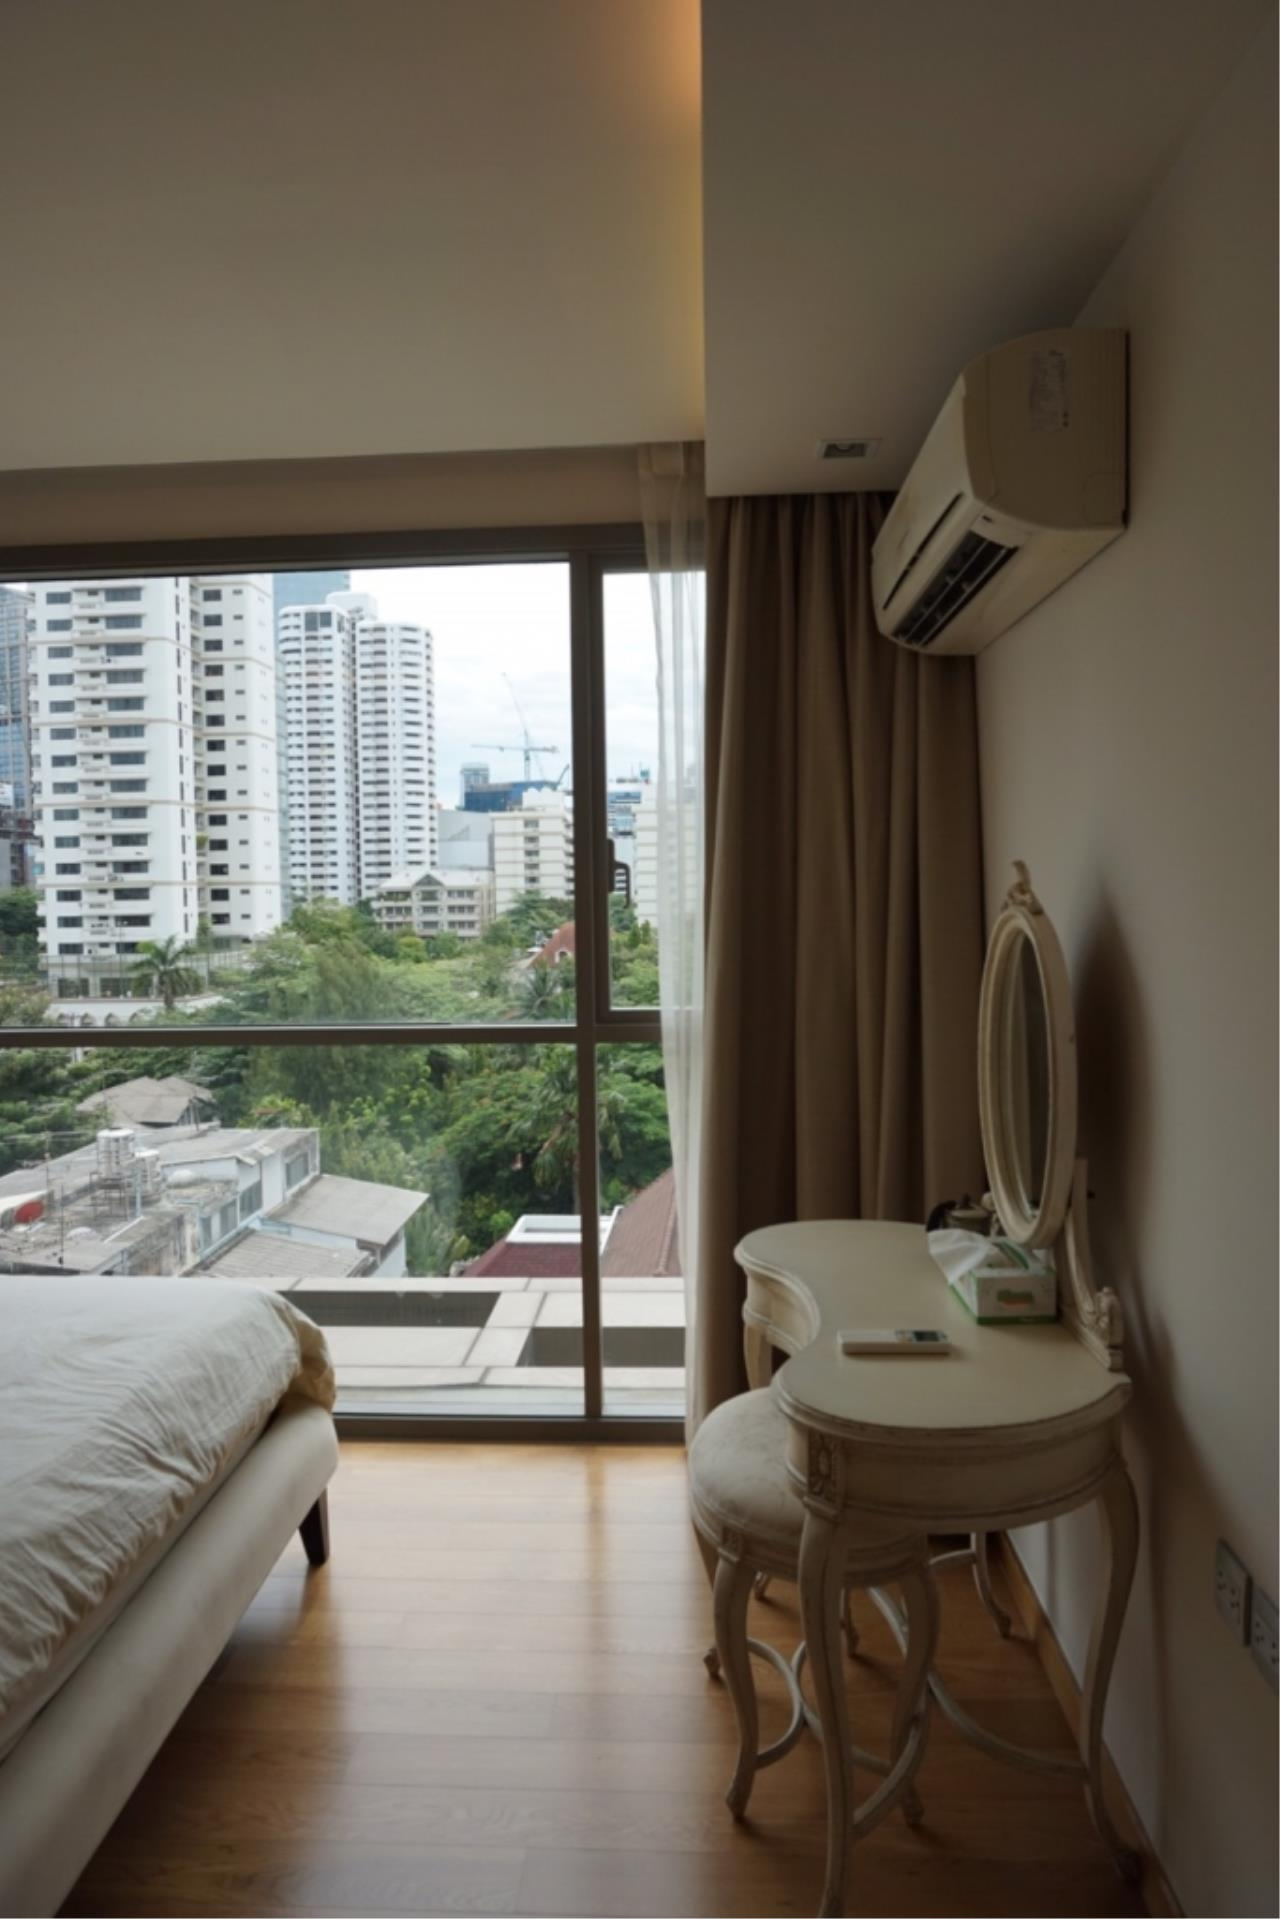 Century21 Skylux Agency's Via Botani / Condo For Sale / 1 Bedroom / 47 SQM / BTS Phrom Phong / Bangkok 3